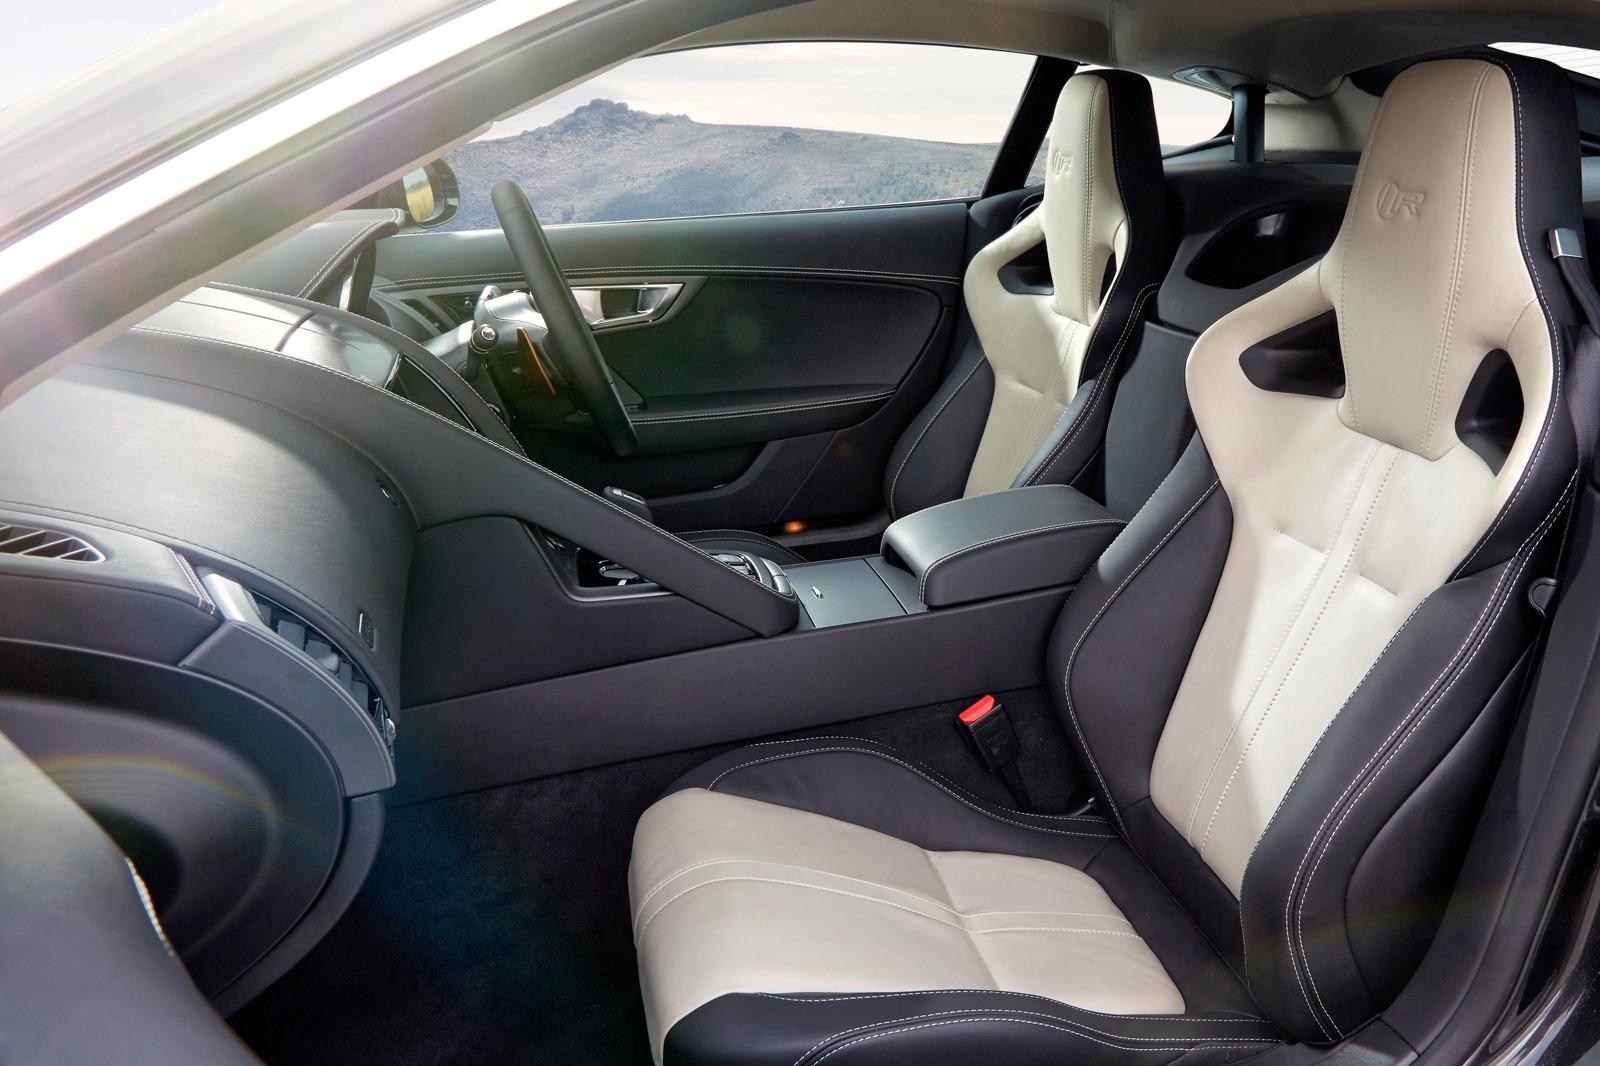 New-Jaguar-F-Type-Coupe-68[2]